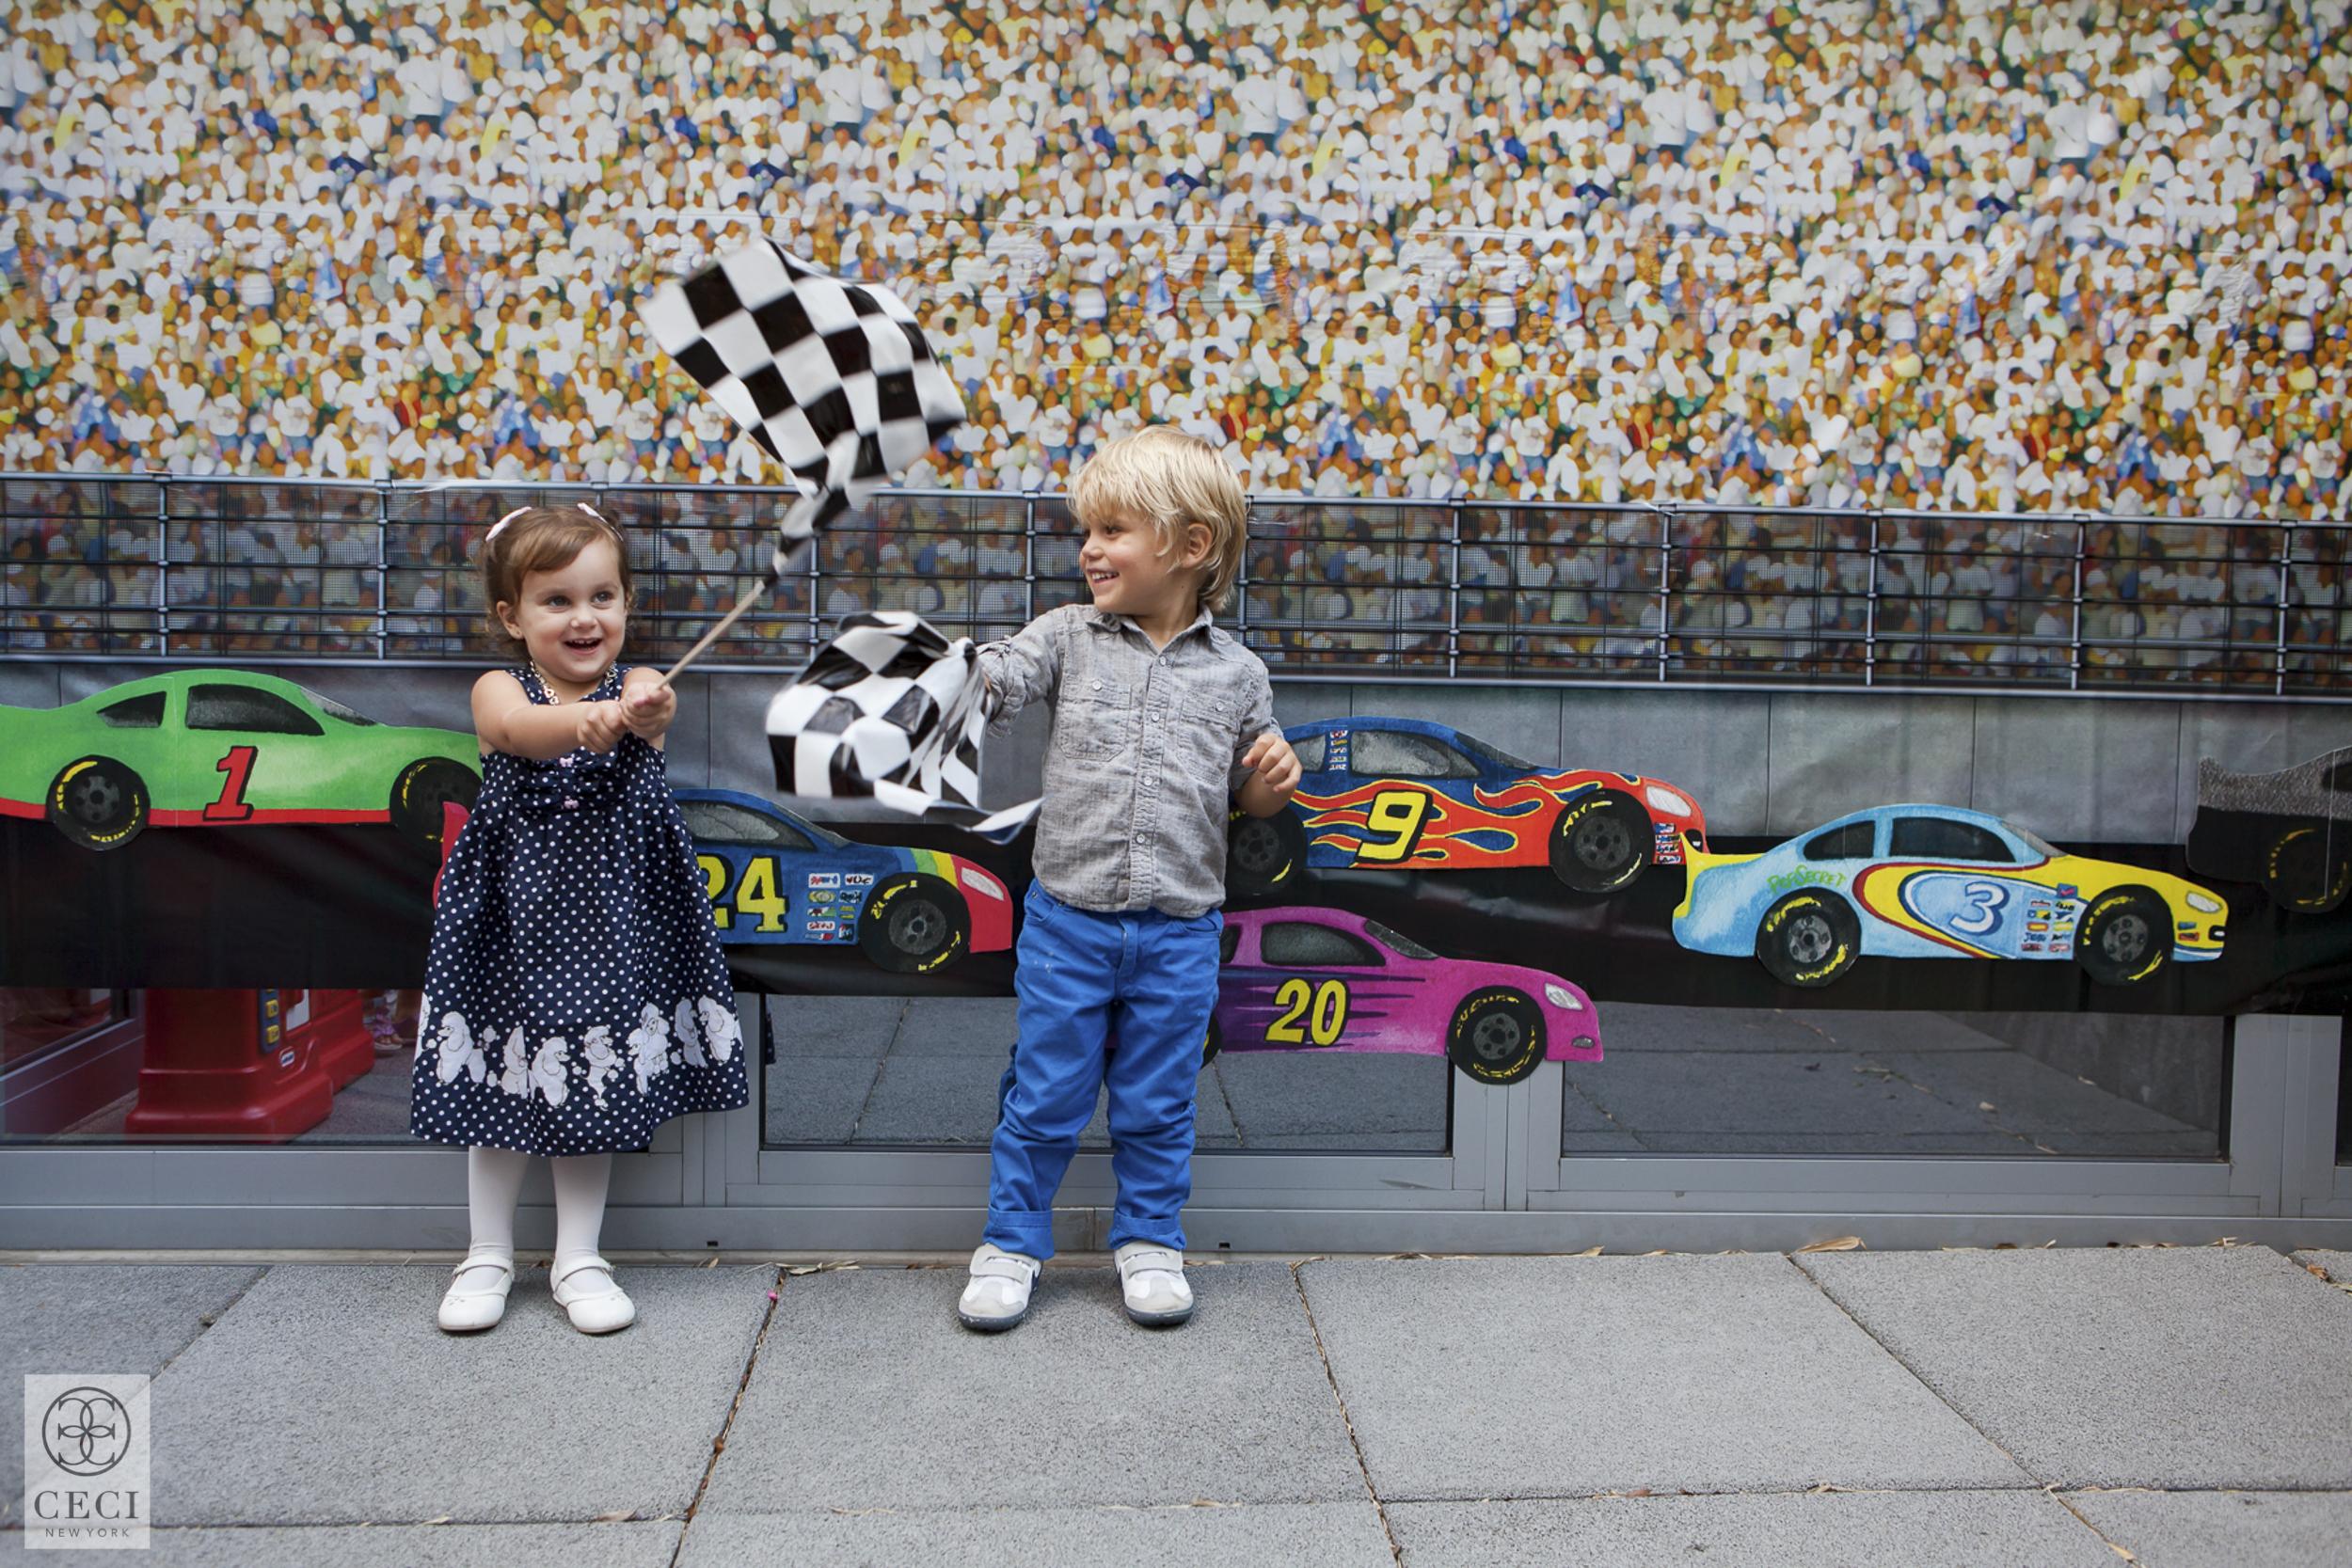 ceci_new_york_mason_ceci_johnson_race_car_birthday_party-21.jpg